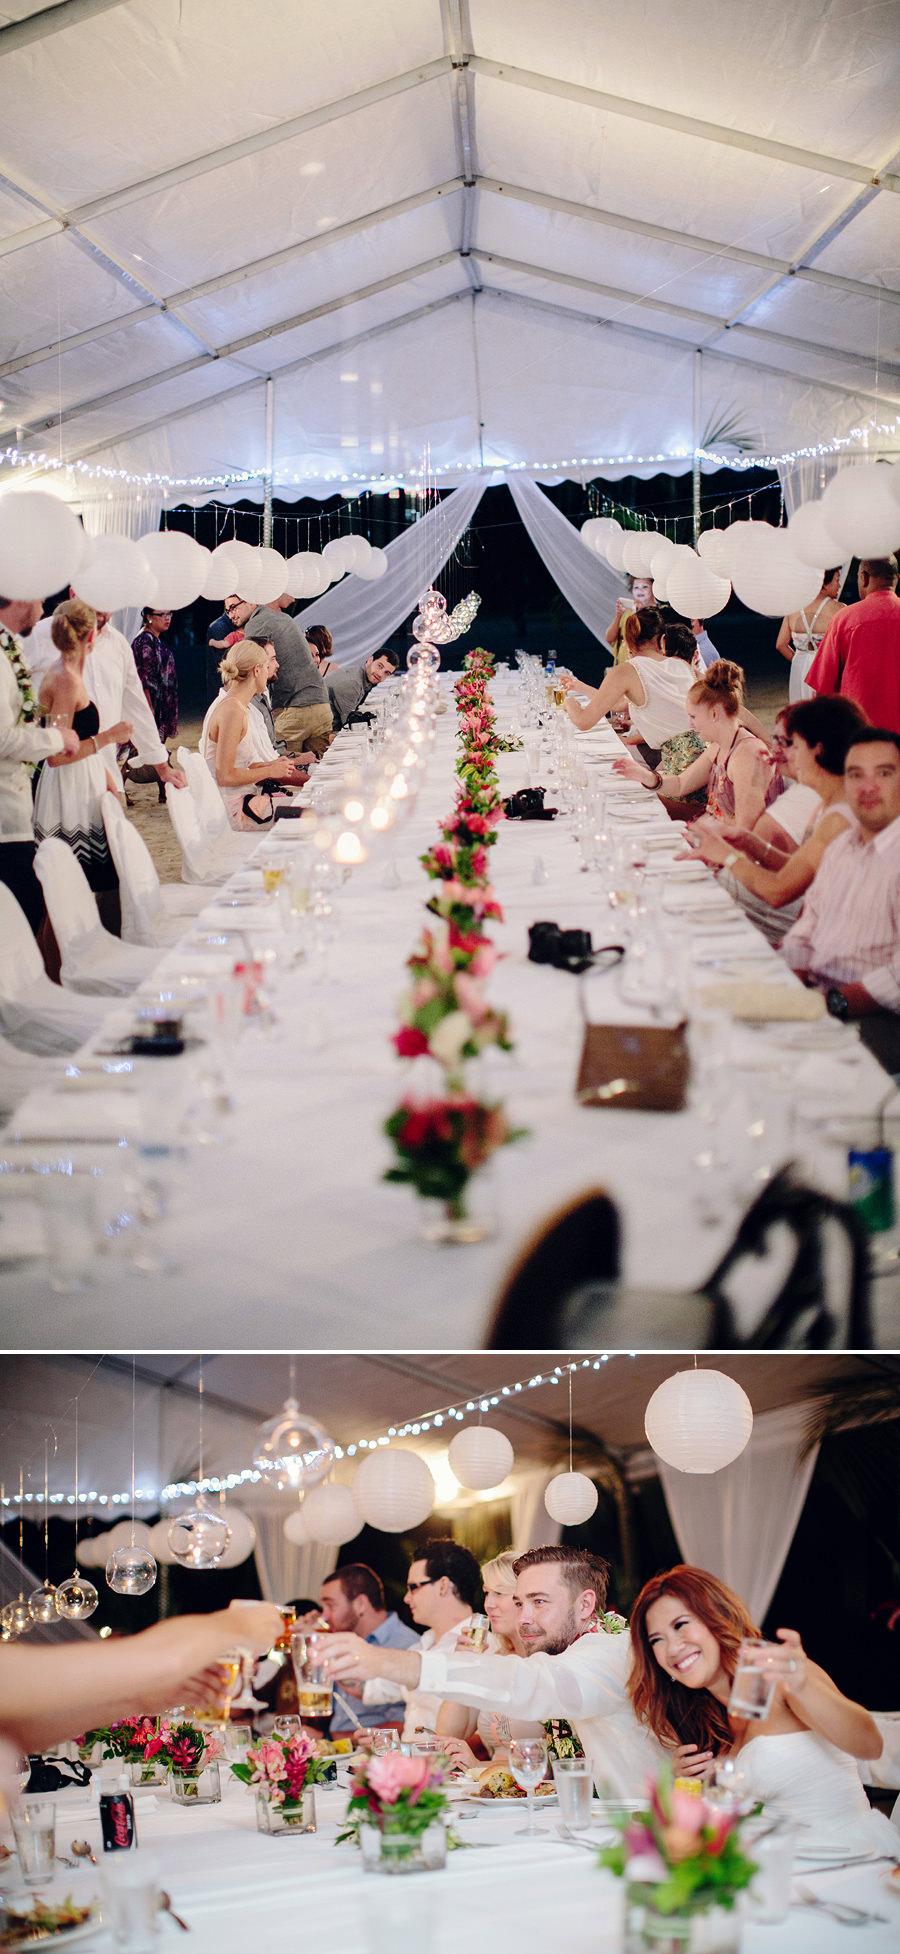 Vanuatu Wedding Photographers: Reception